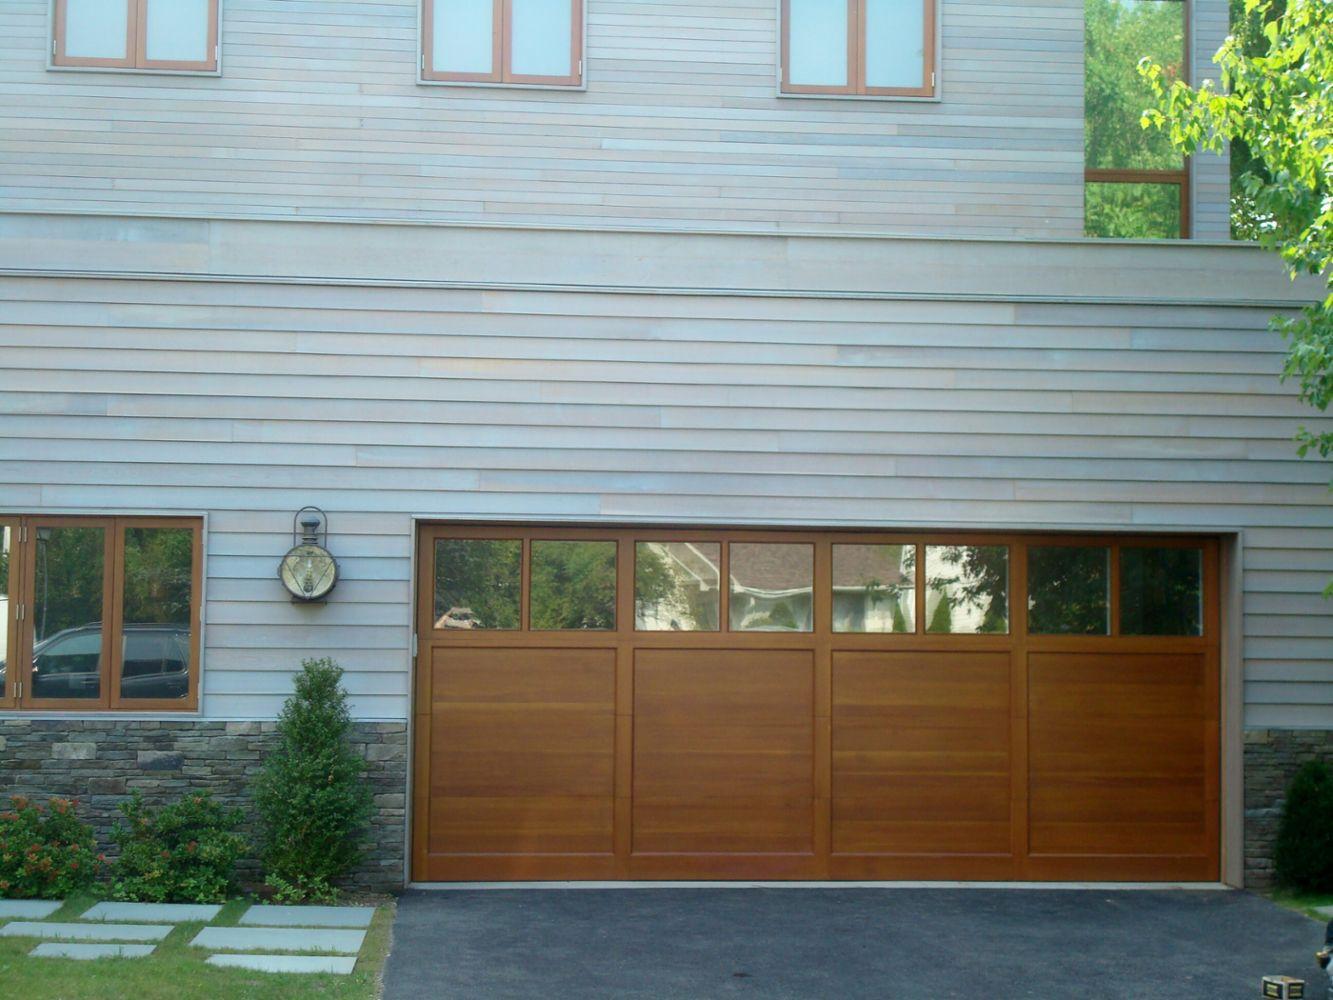 Garage Doors Pleasanton Cafordable Garage Doors East Bay